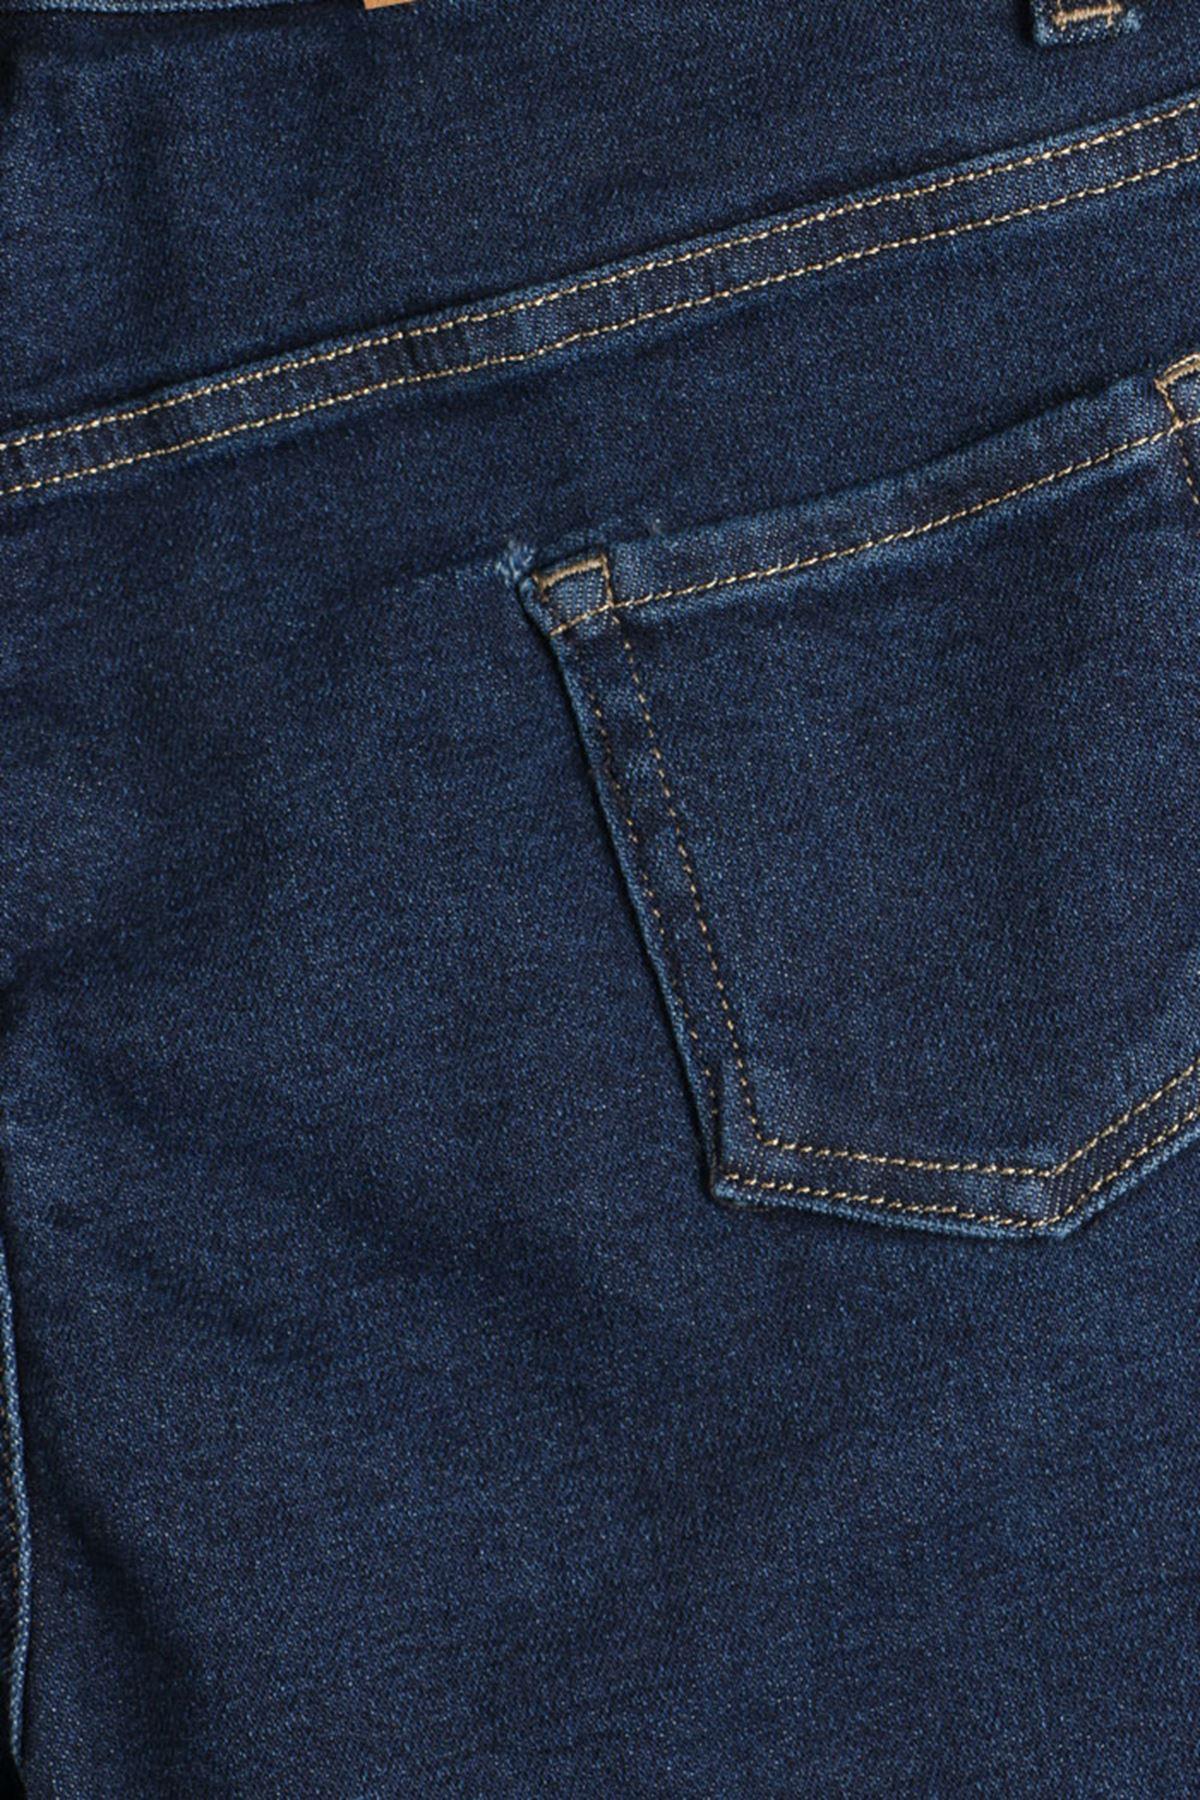 D-9125-1 Büyük Beden Defolu BoyFriend Kot Pantolon-Lacivert